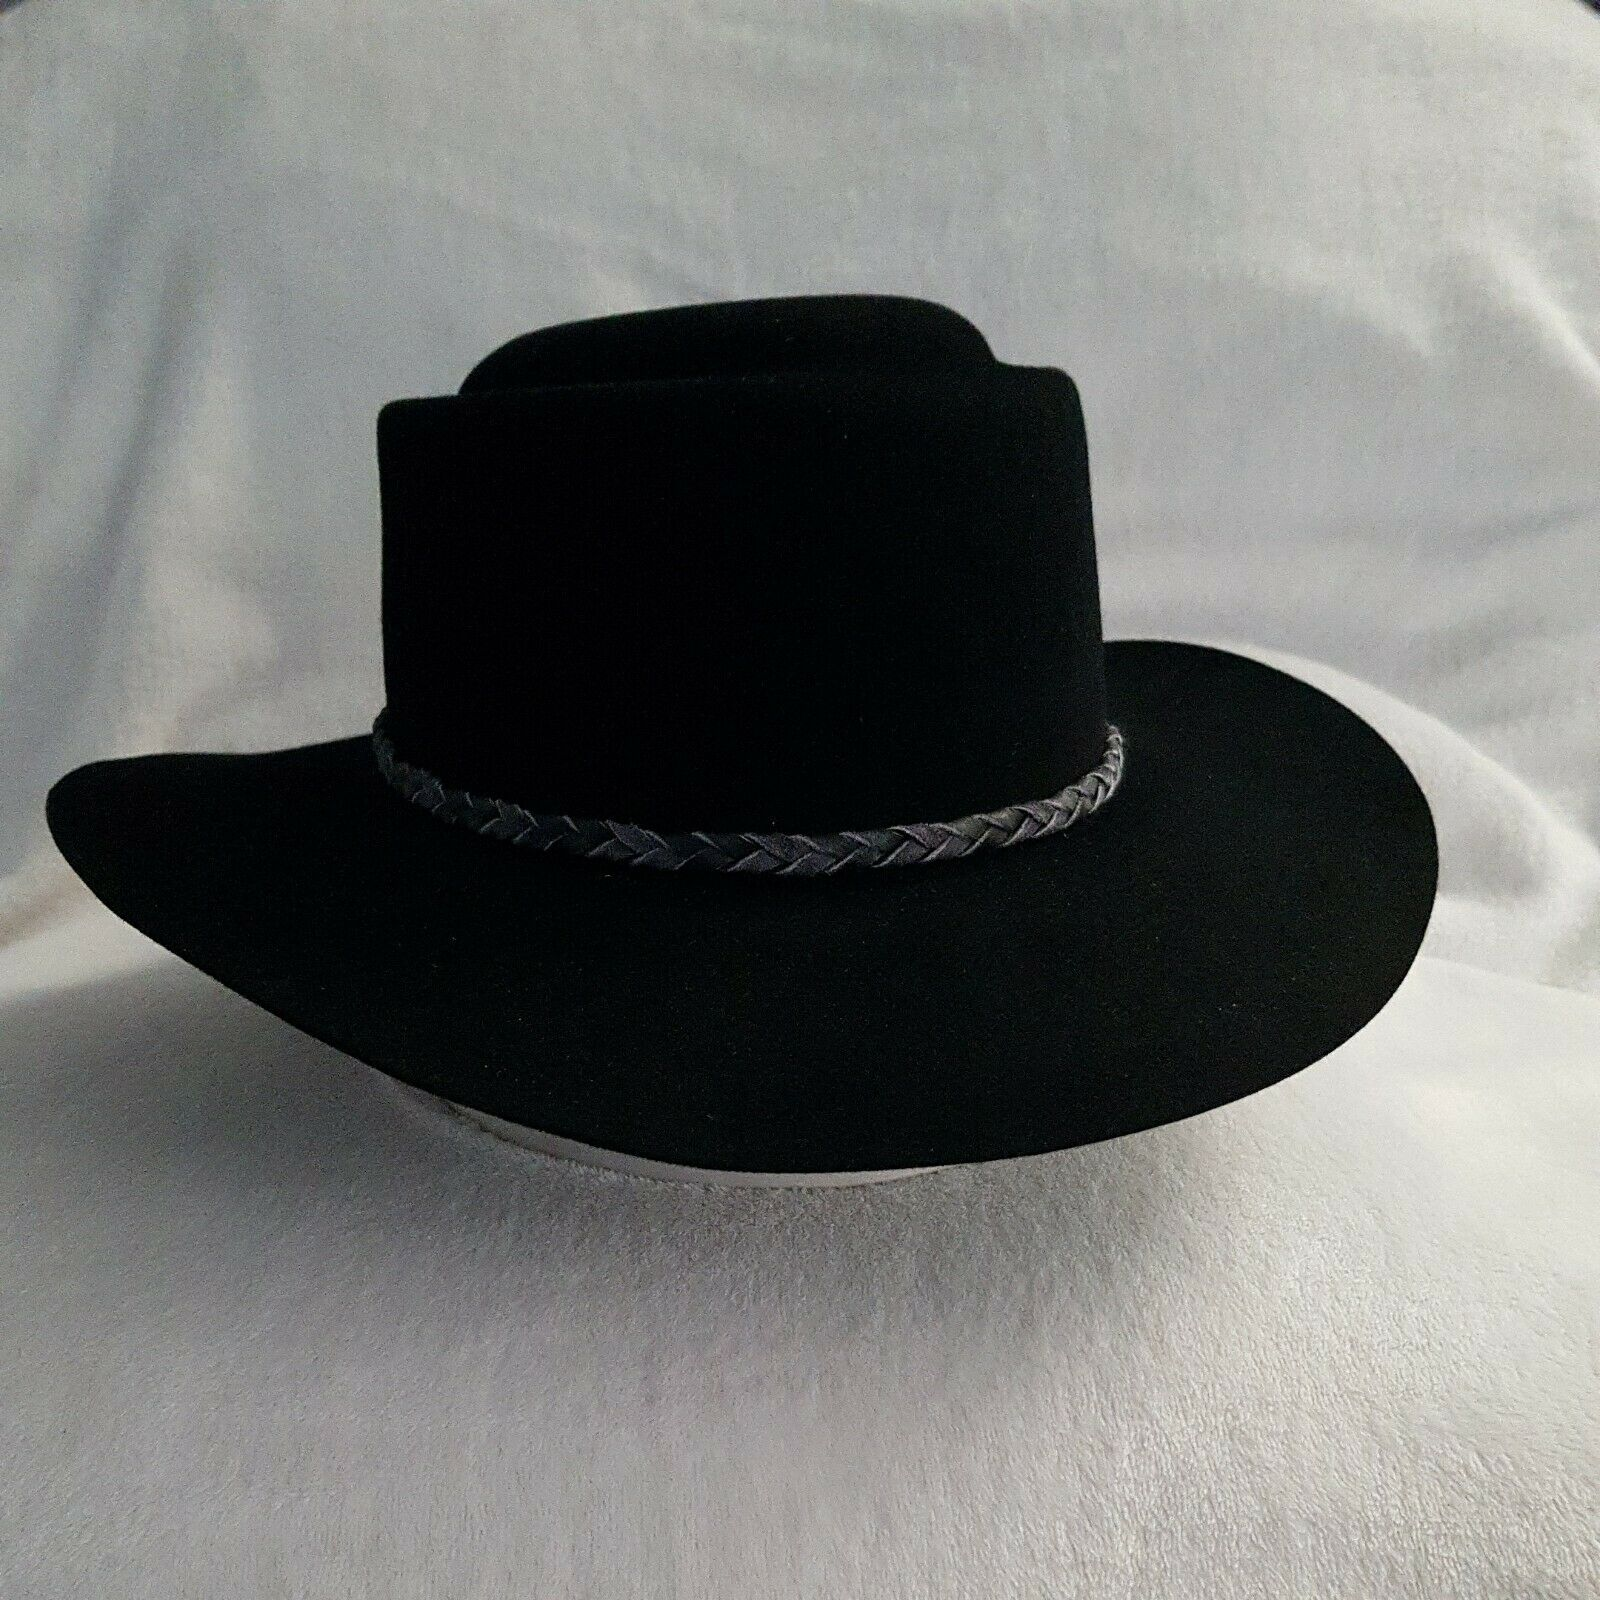 Stetson Gunnison Black Western Hat, Wool Felt, Hat, New and Unused